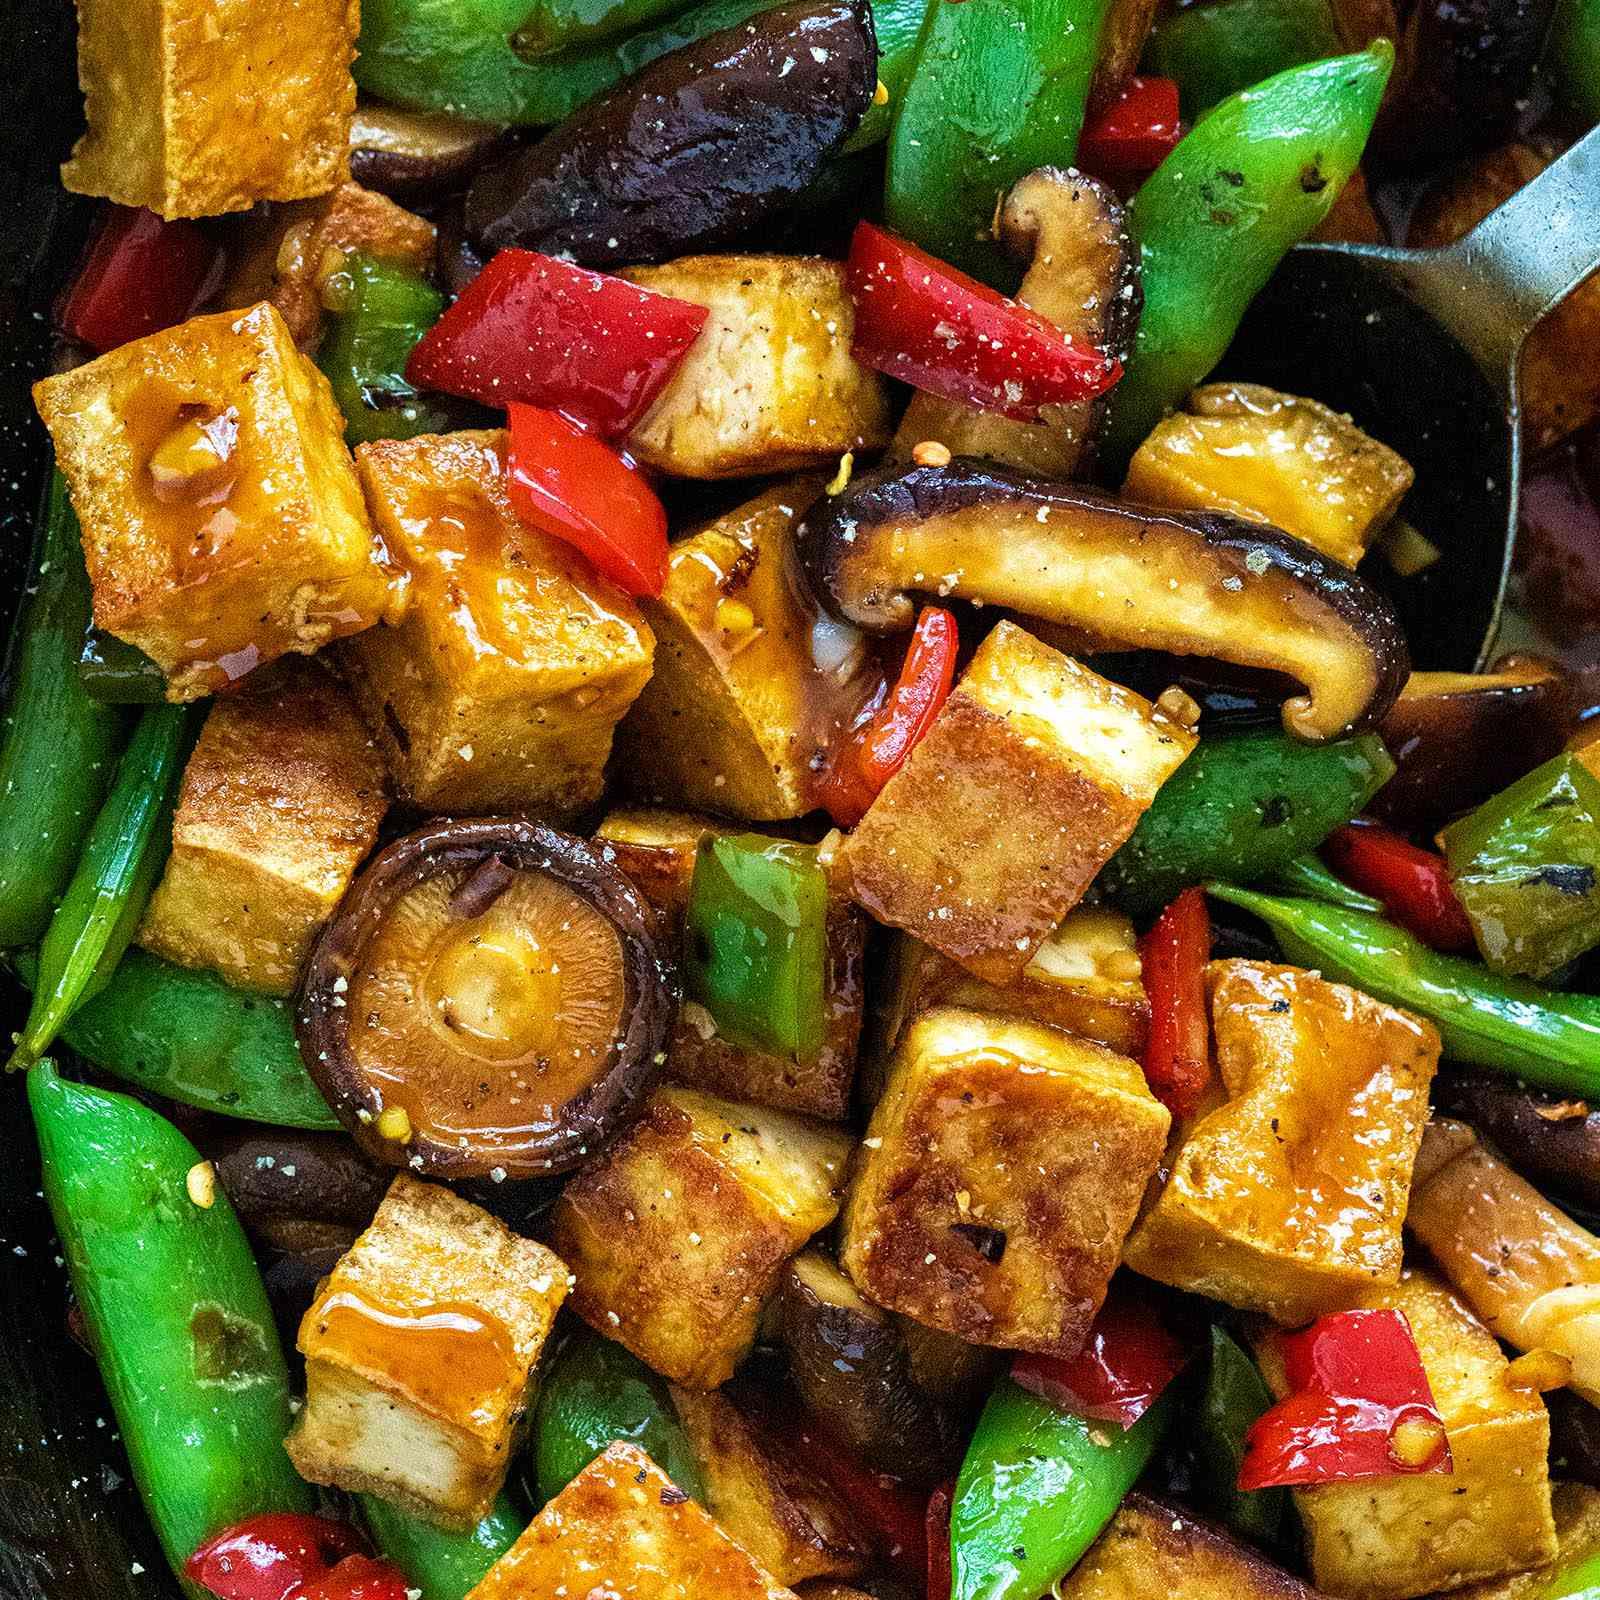 Vegetarian Stir Fry with Tofu with snap peas.